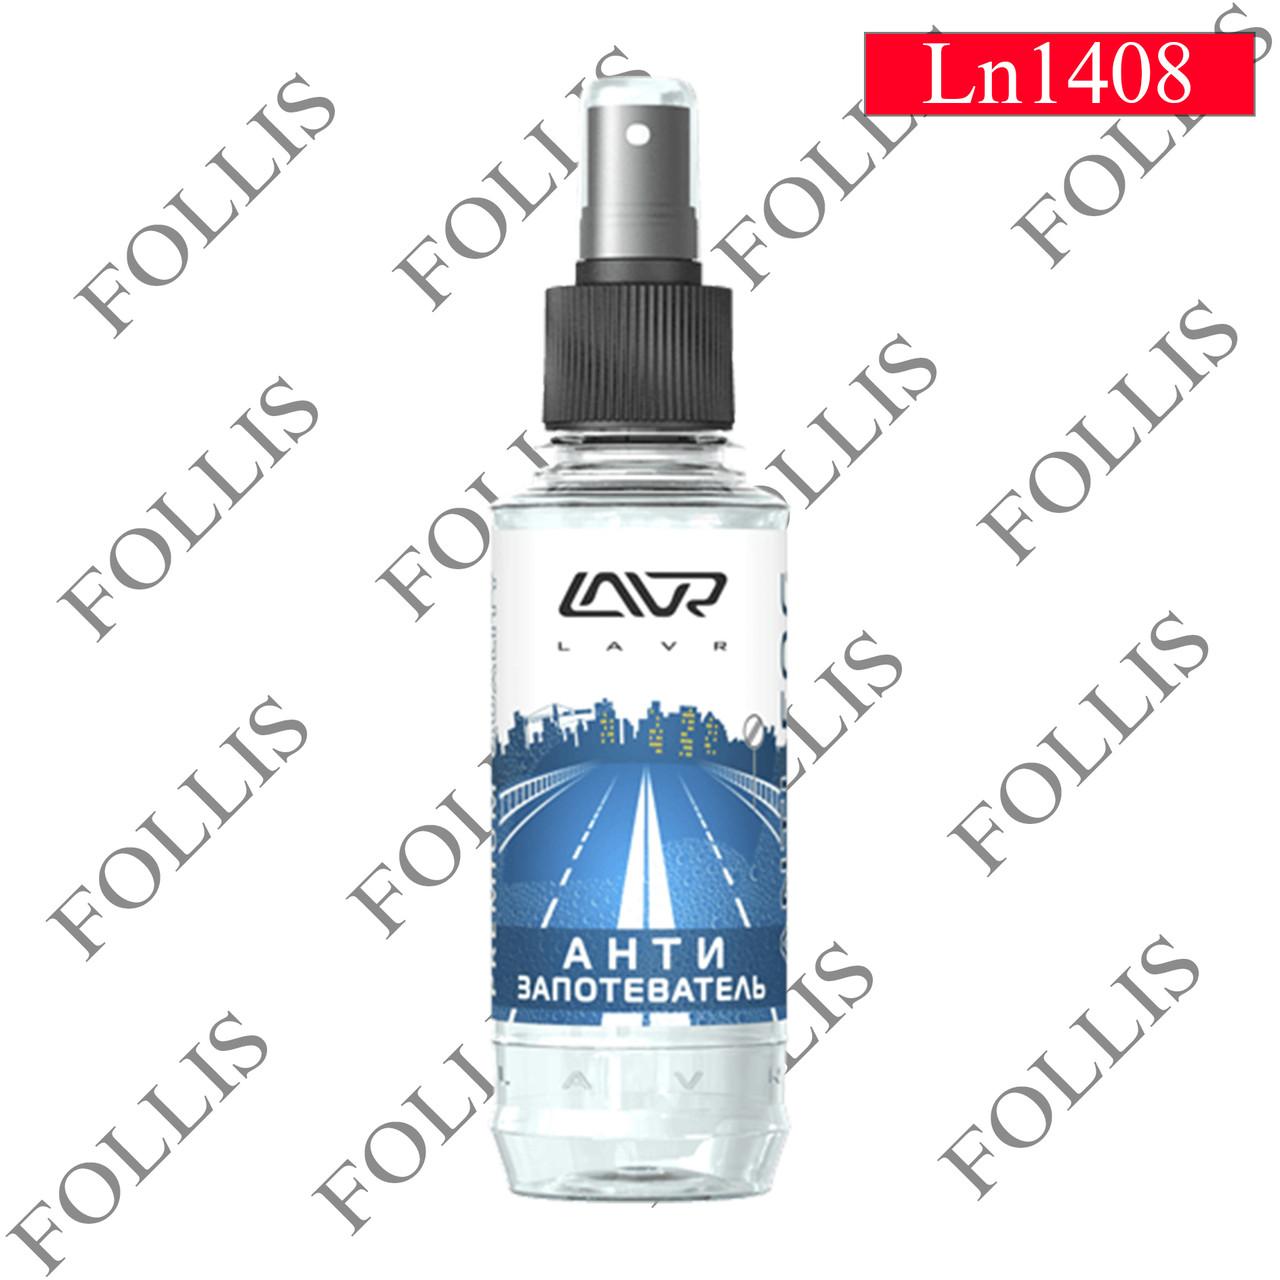 Антизапотеватель со спреем LAVR Anti Fog 185 мл (9шт. в шоу-боксе)